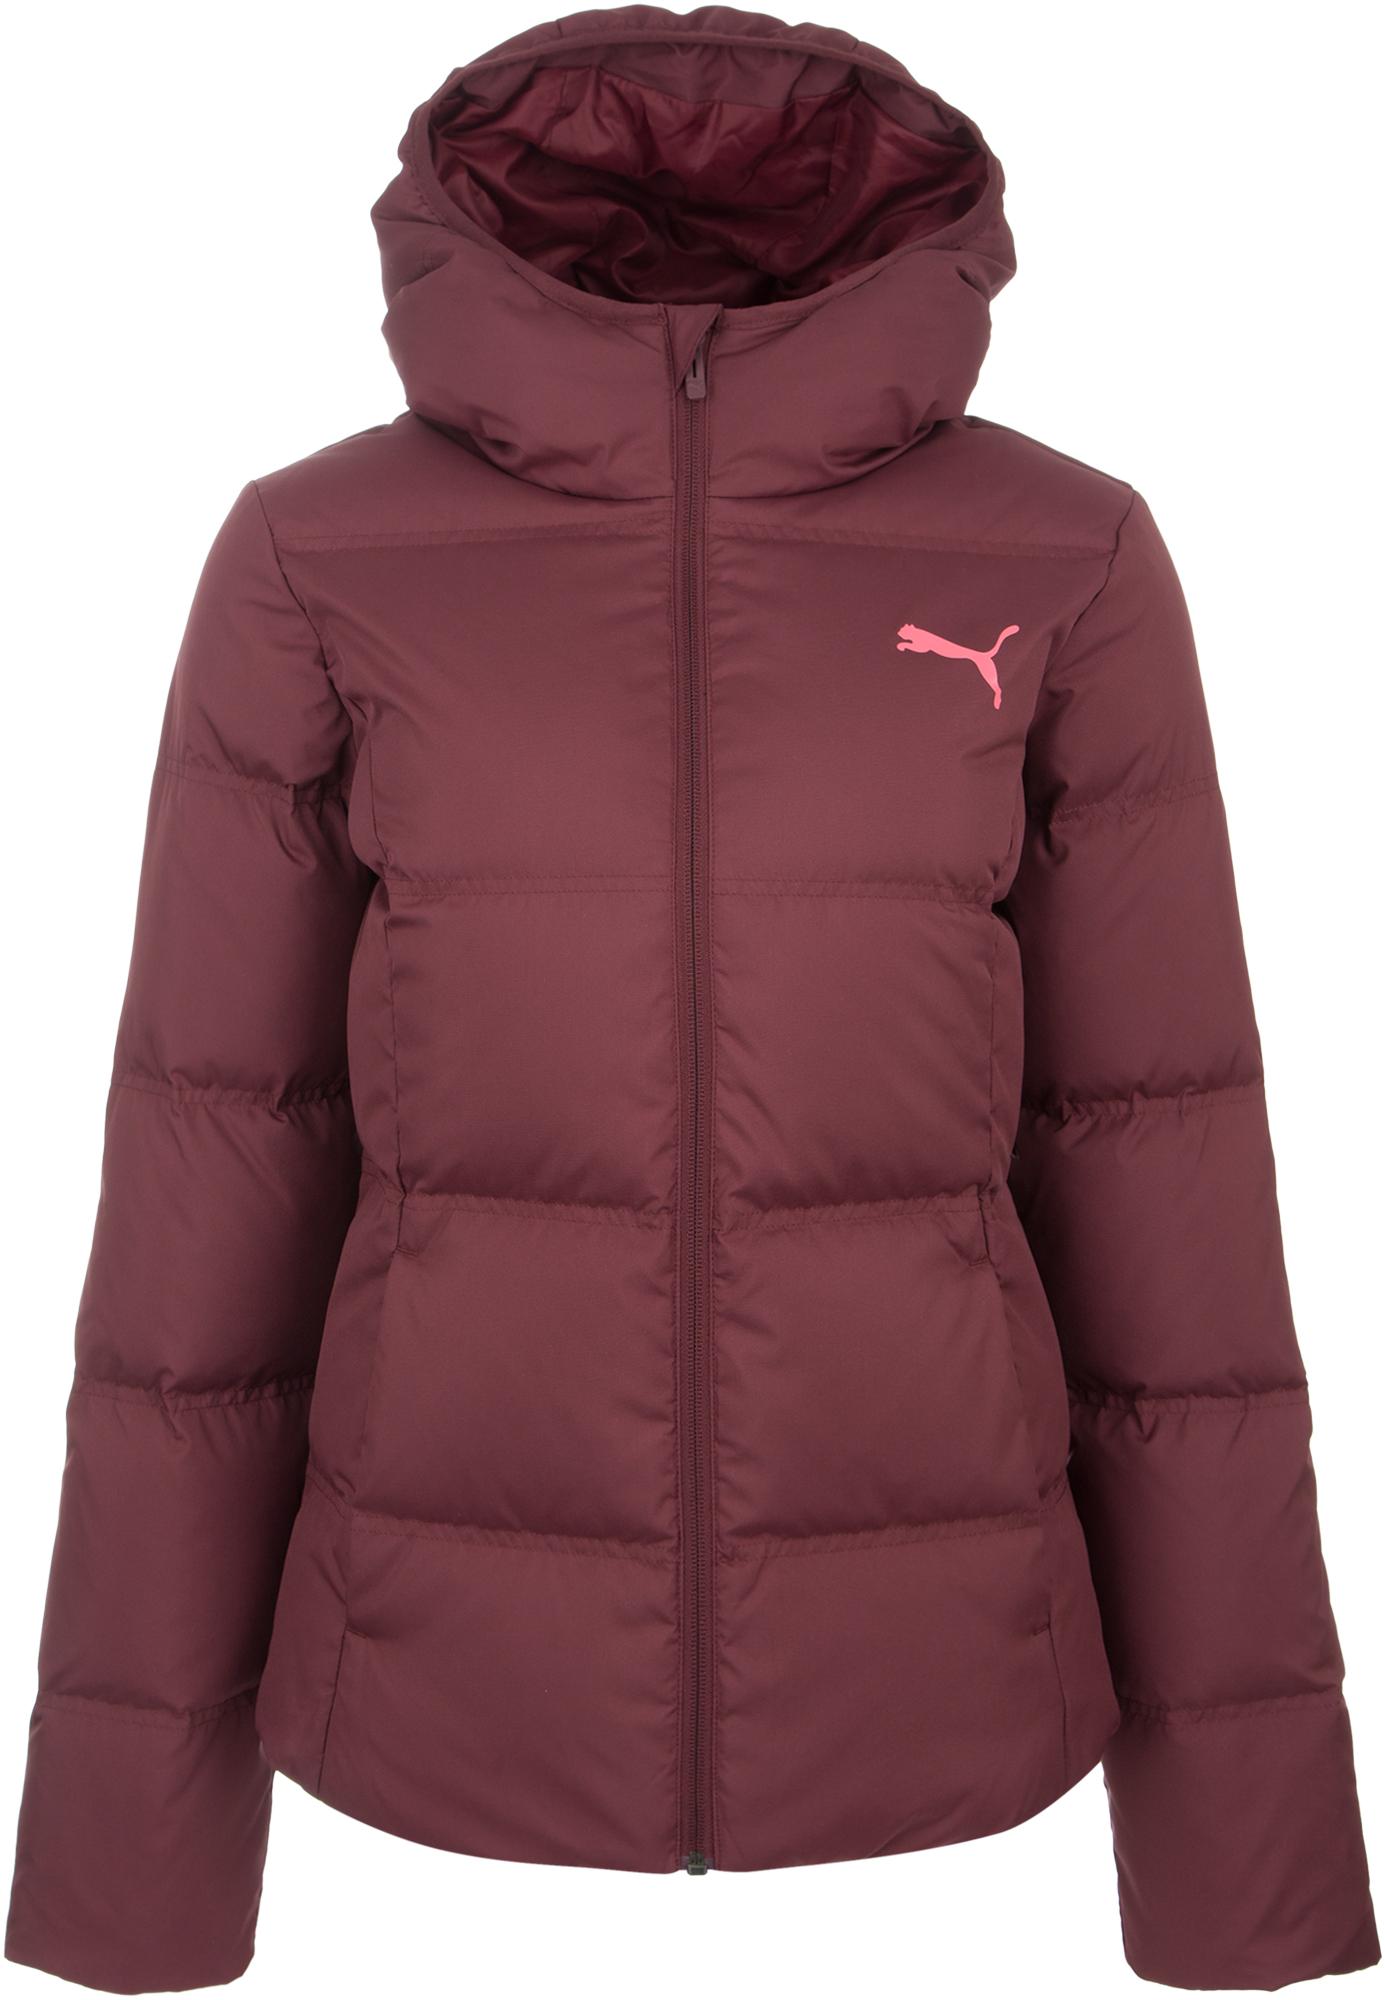 пуховик женский puma 70 30 480 down jacket цвет молочный 85166611 размер m 44 46 Puma Куртка пуховая женская Puma Essentials, размер 46-48